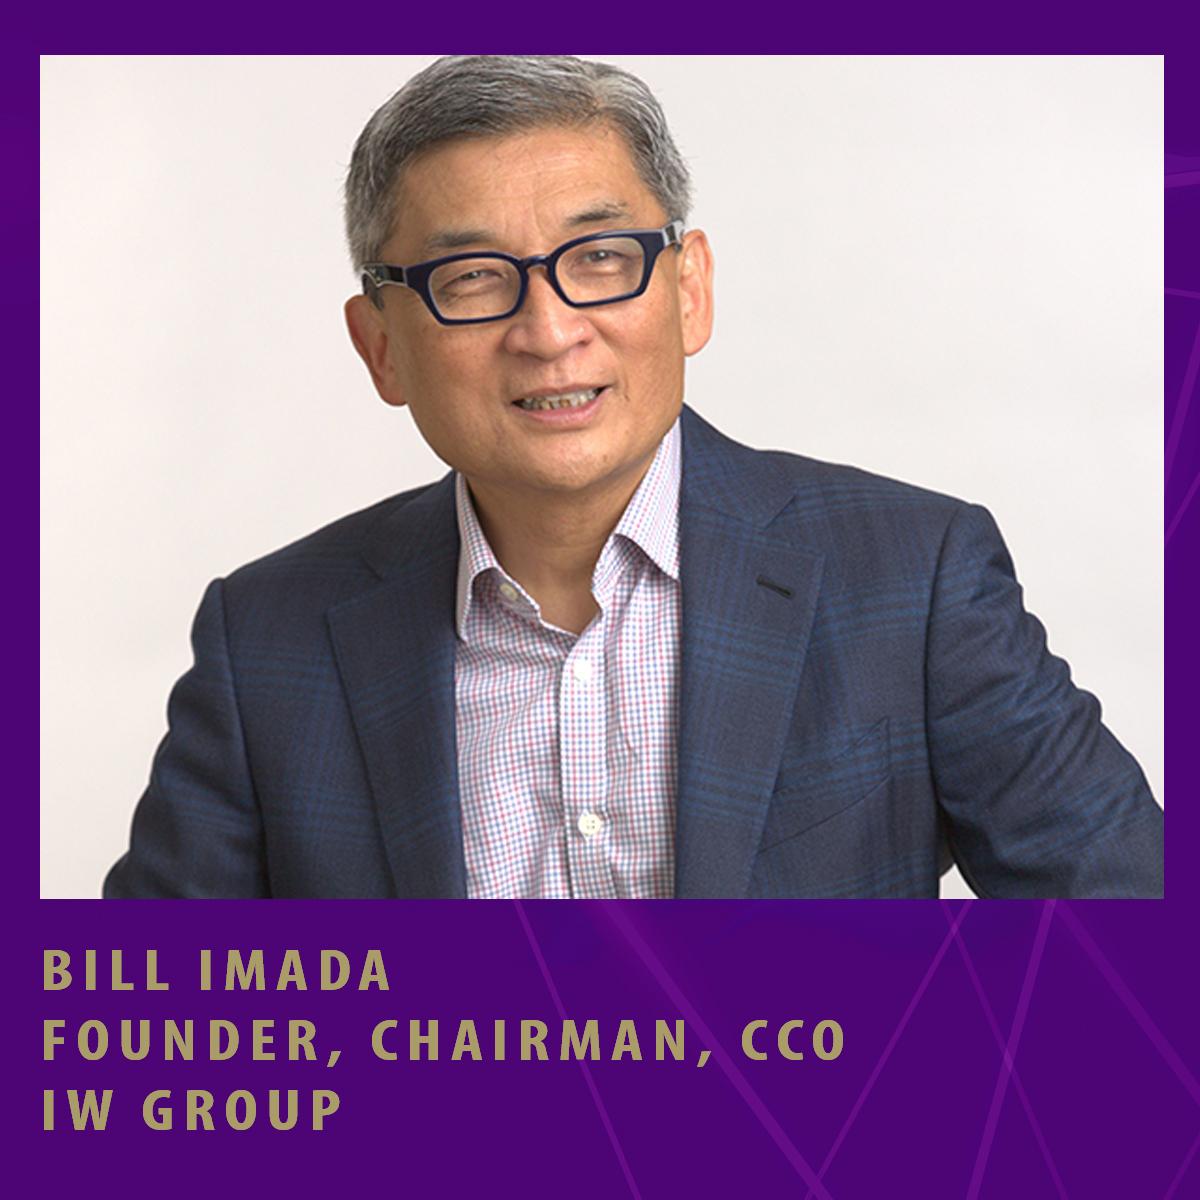 Bill Imada